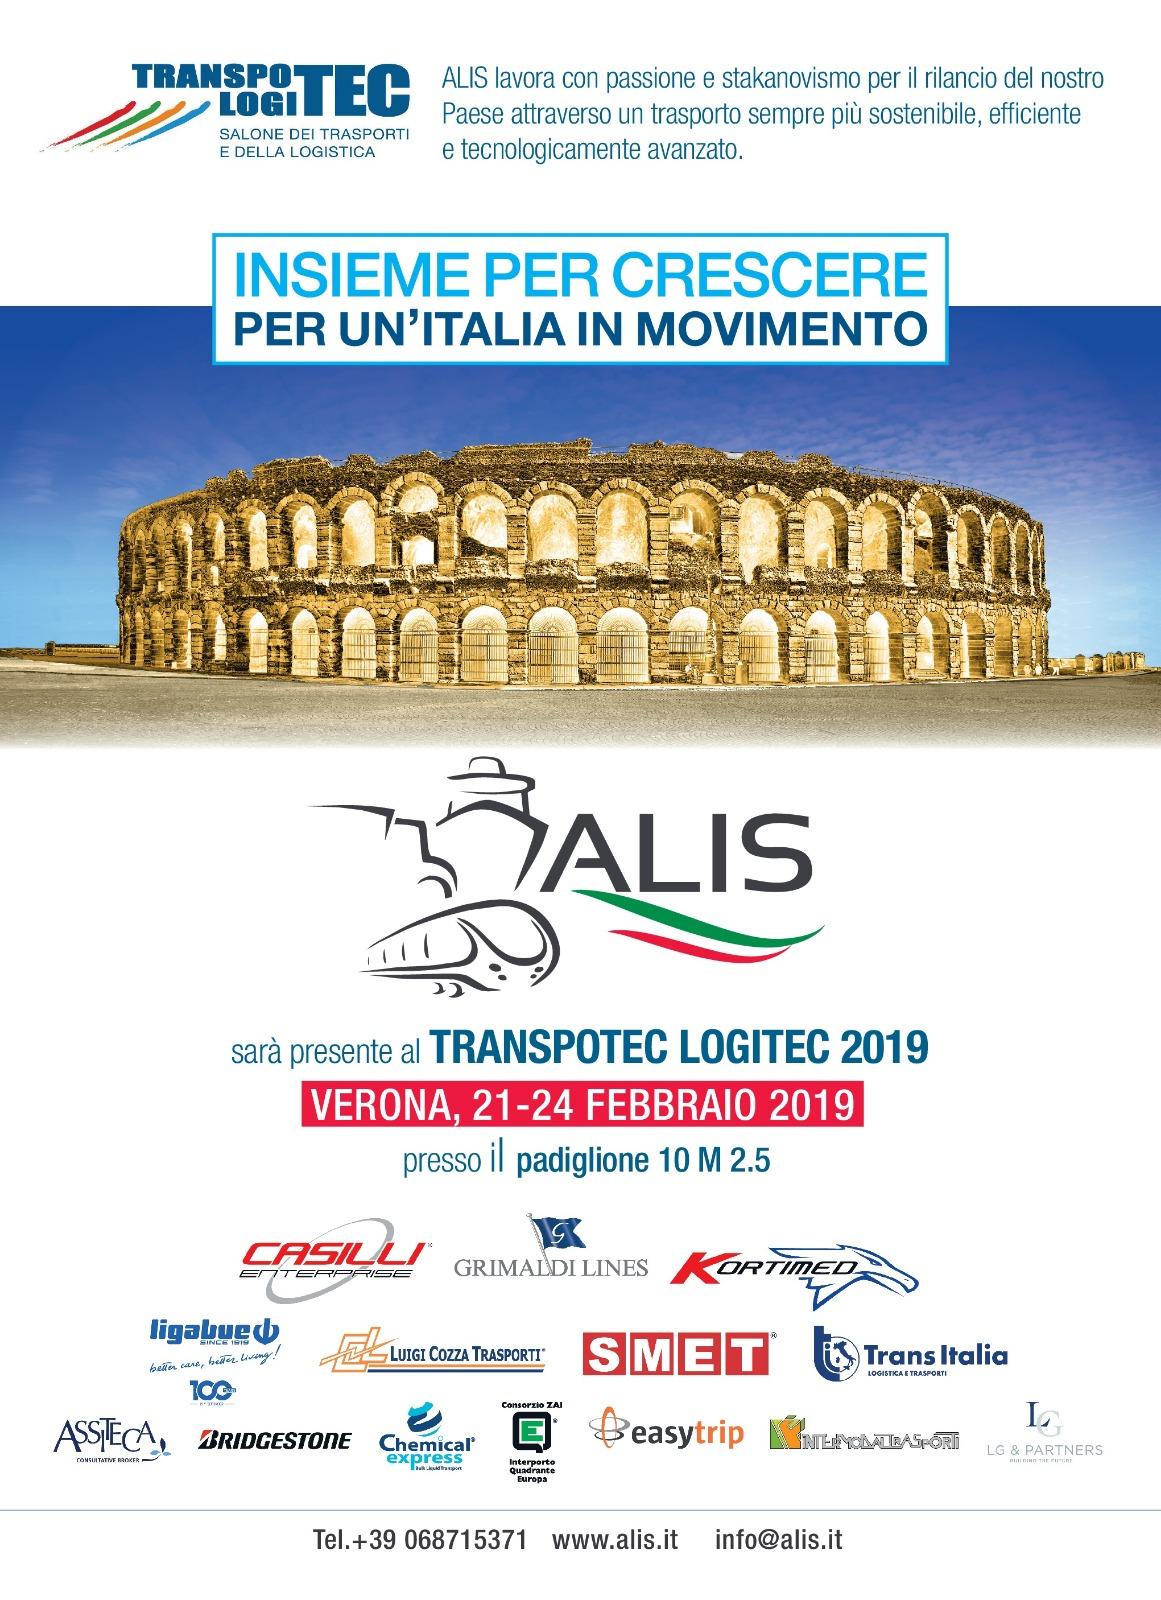 Transpotec Verona: conferenze ALIS giovedì 21 febbraio